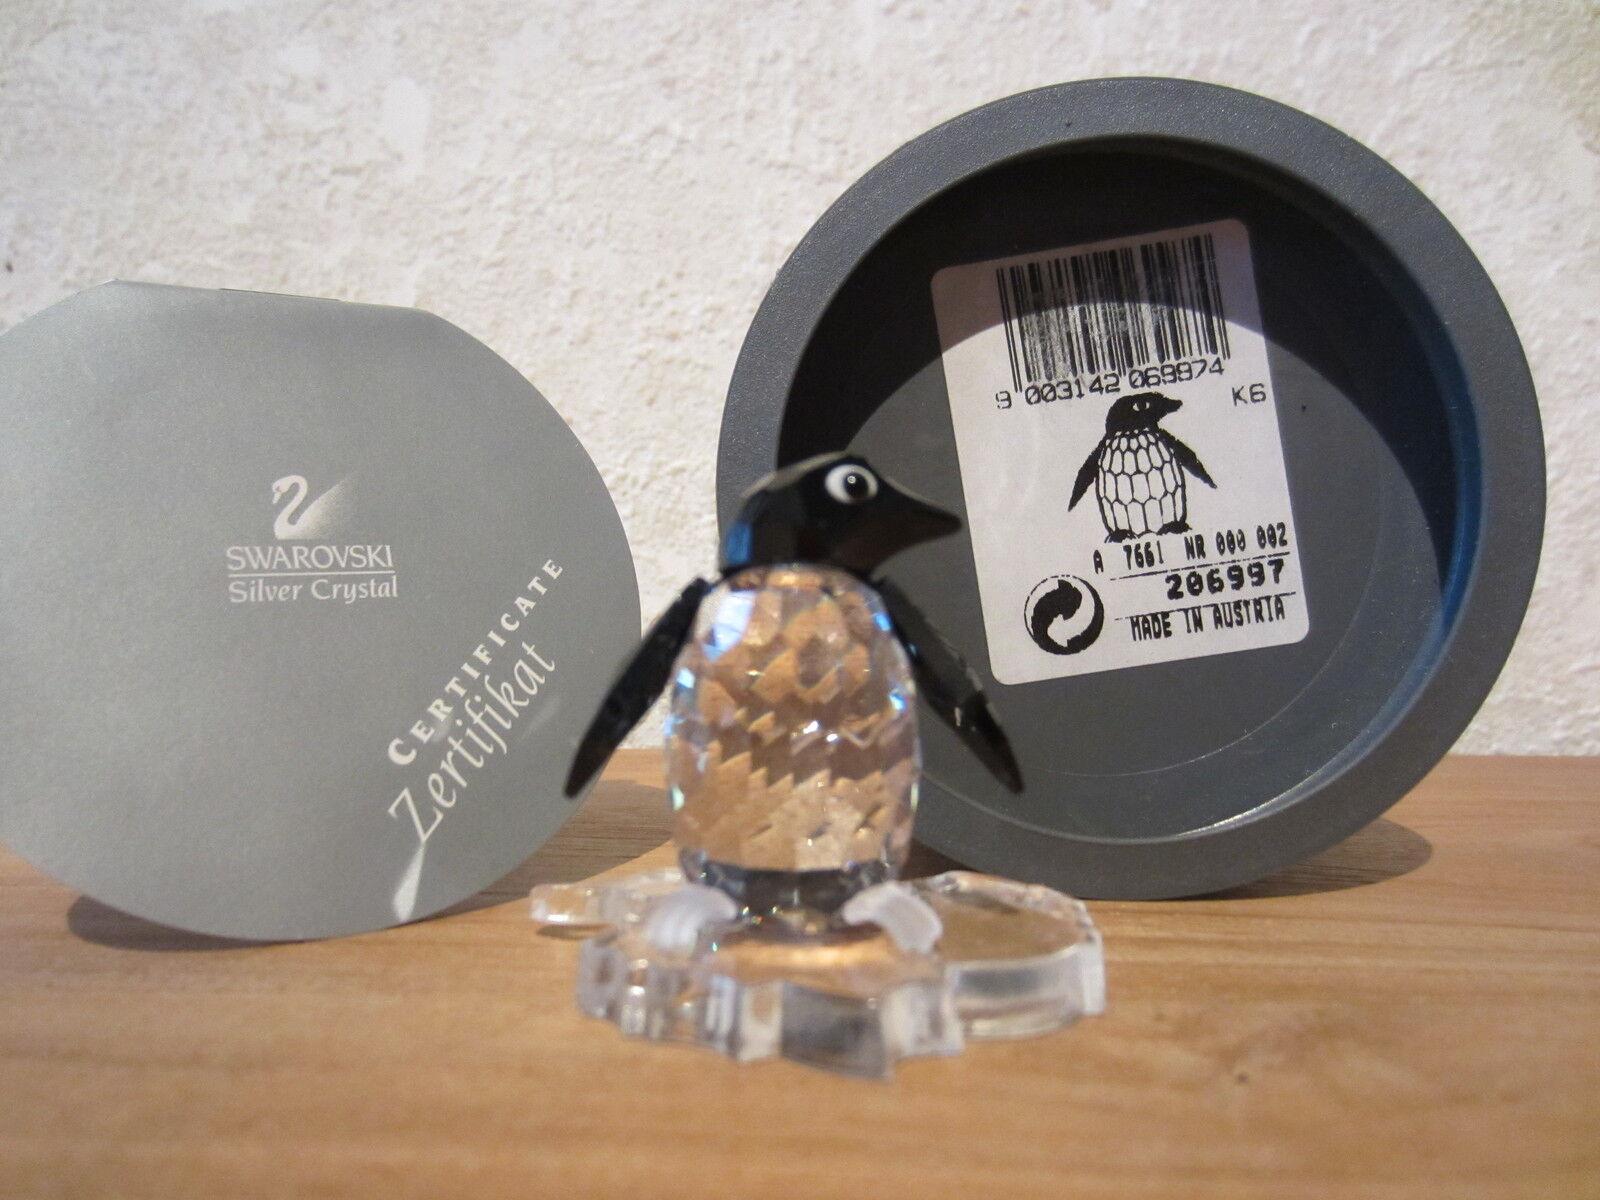 SWAROVSKI NEW Madame Pingouin Madame Penguin 206997 H.3,8cm with stand